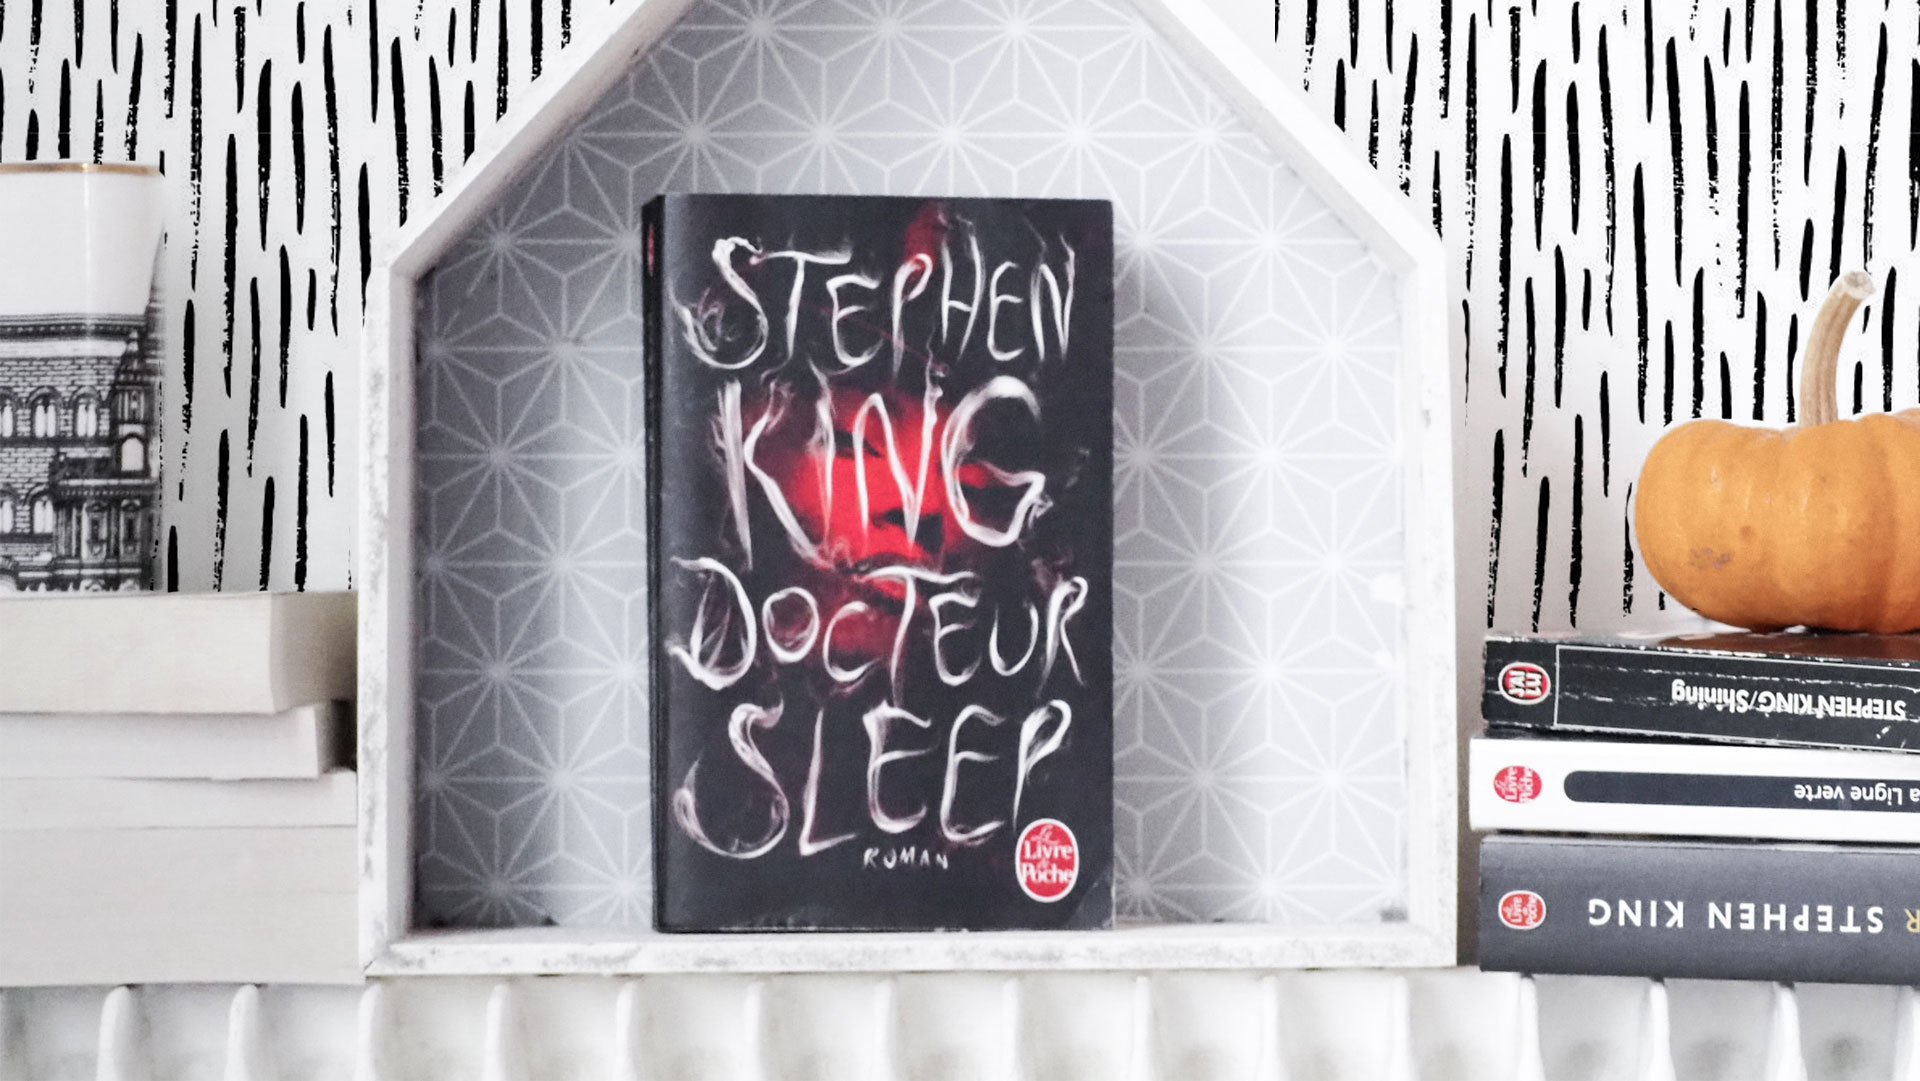 docteur-sleep-king